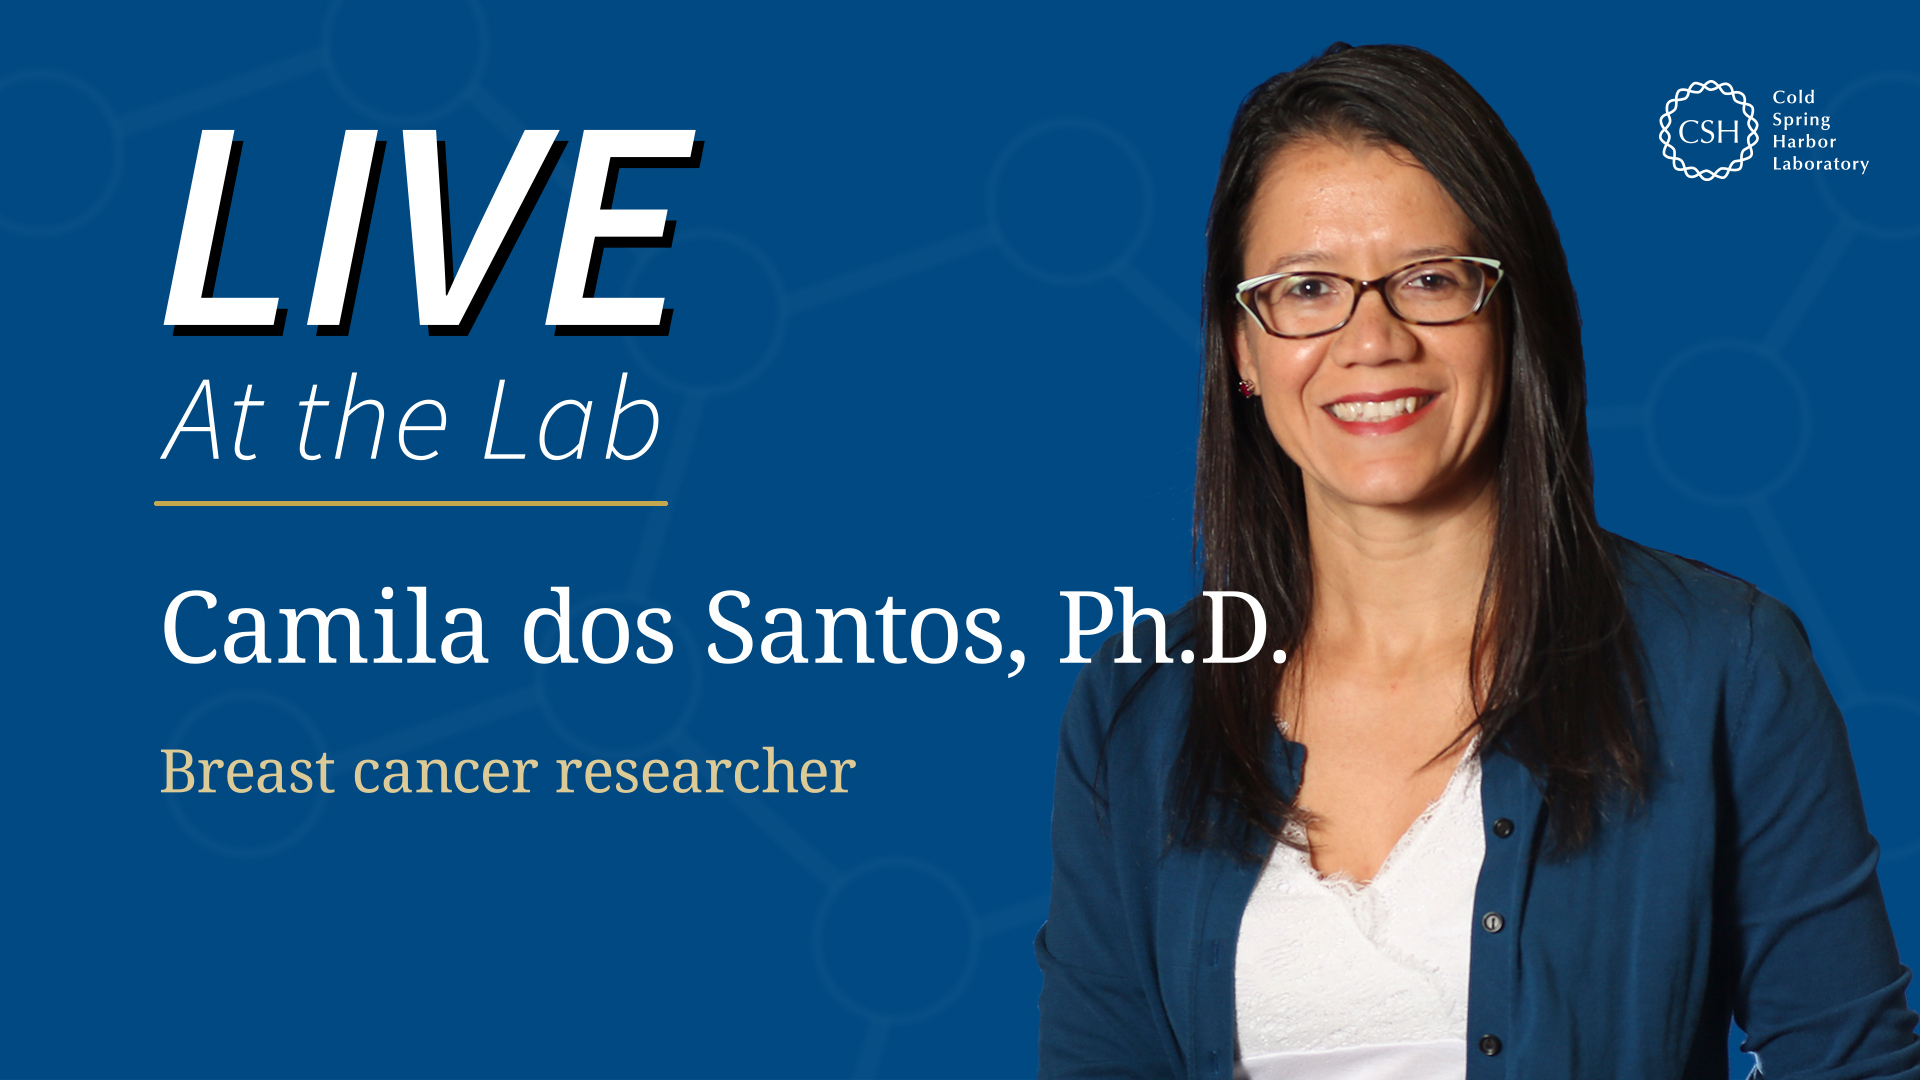 Hero image of Camila dos Santos, Ph.D. for Live at the Lab webinar